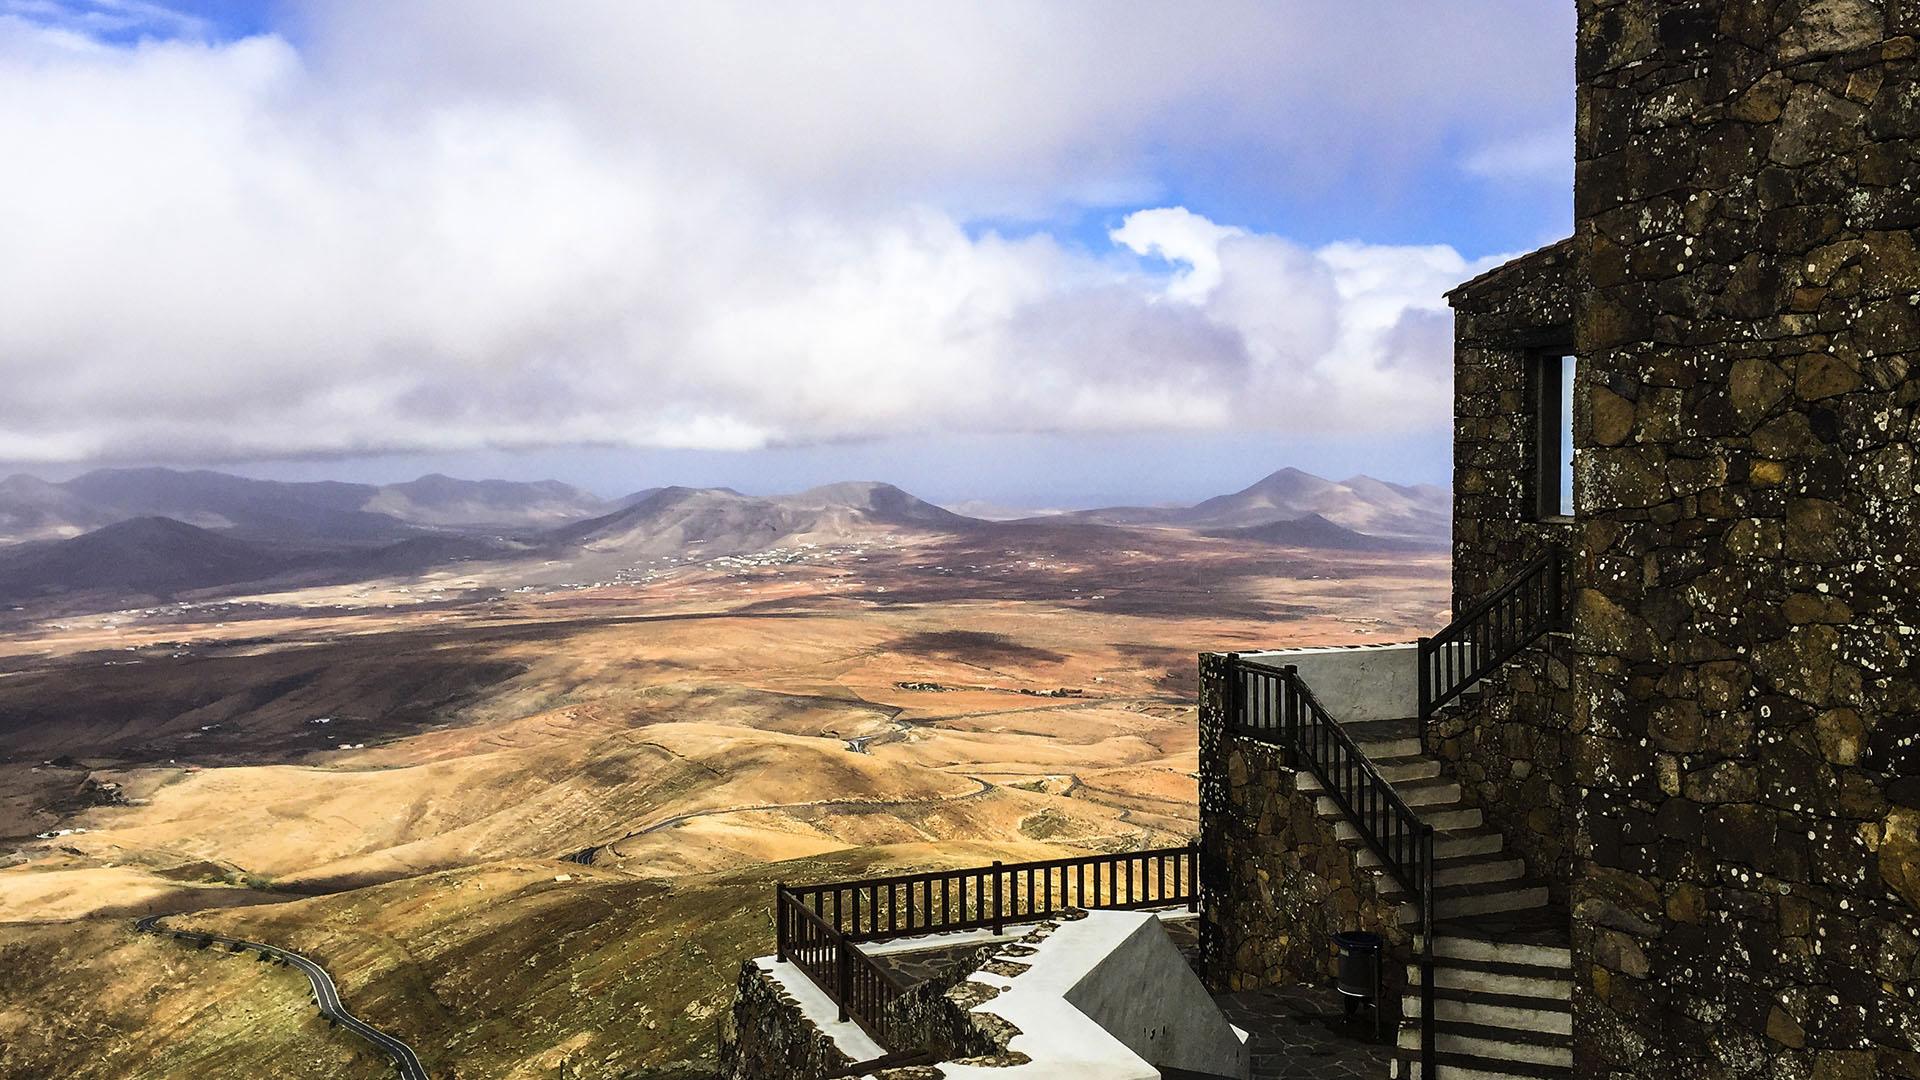 Fuerteventura Inselrundfahrt Zentralmassiv – Betancuria Mirador de Morro Velosa.